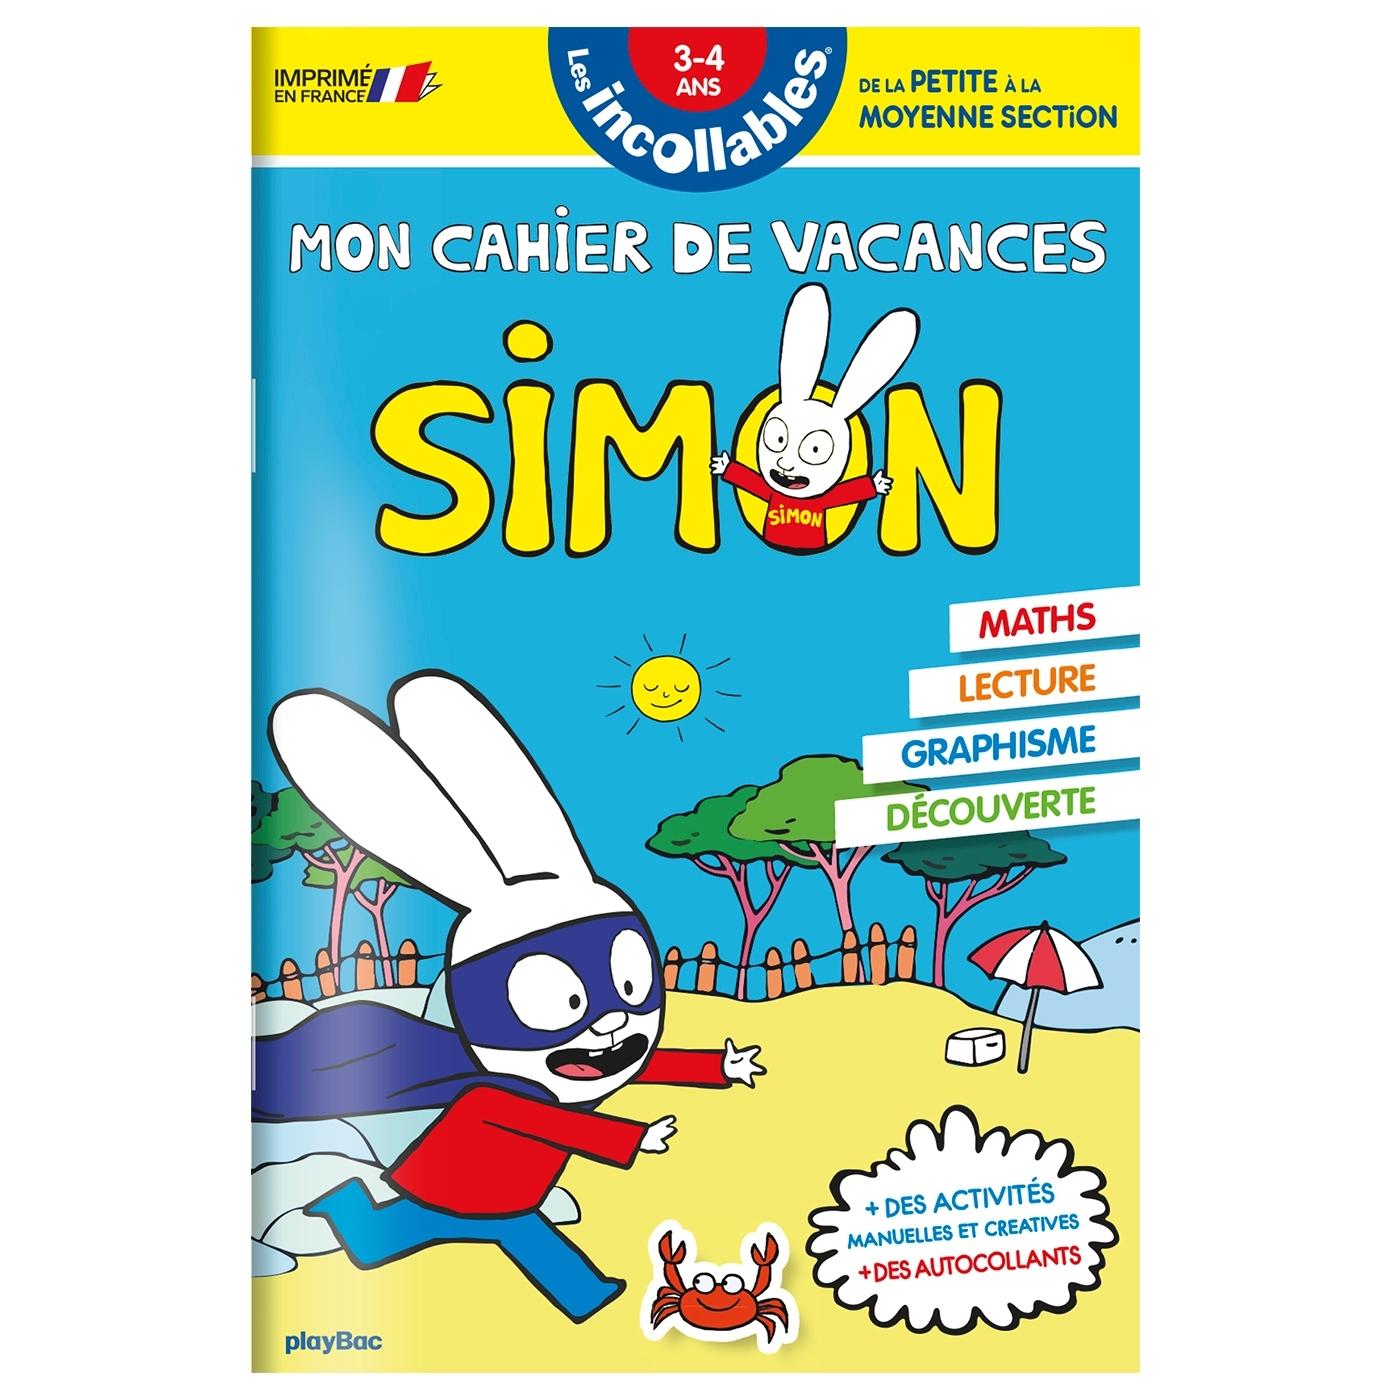 CAHIER DE VACANCES SIMON - DE LA PS A LA MS